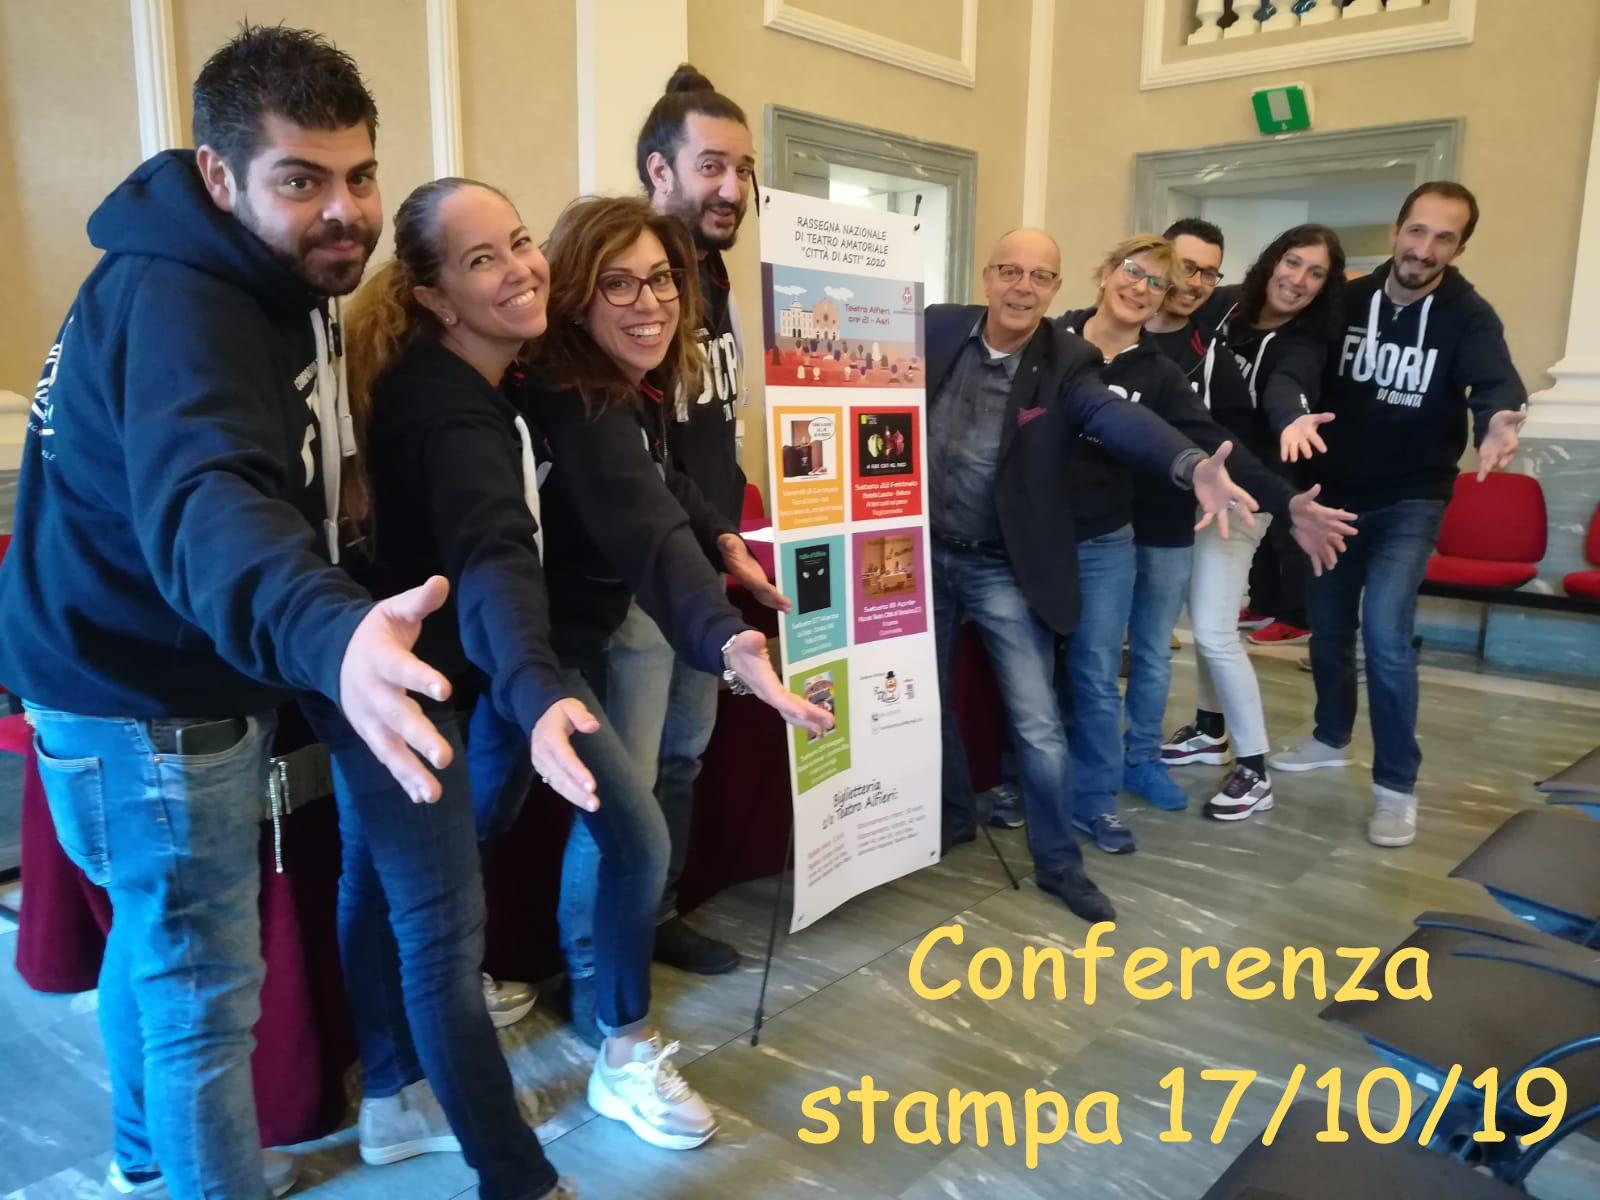 conferenza stampa rassegna Città di Asti